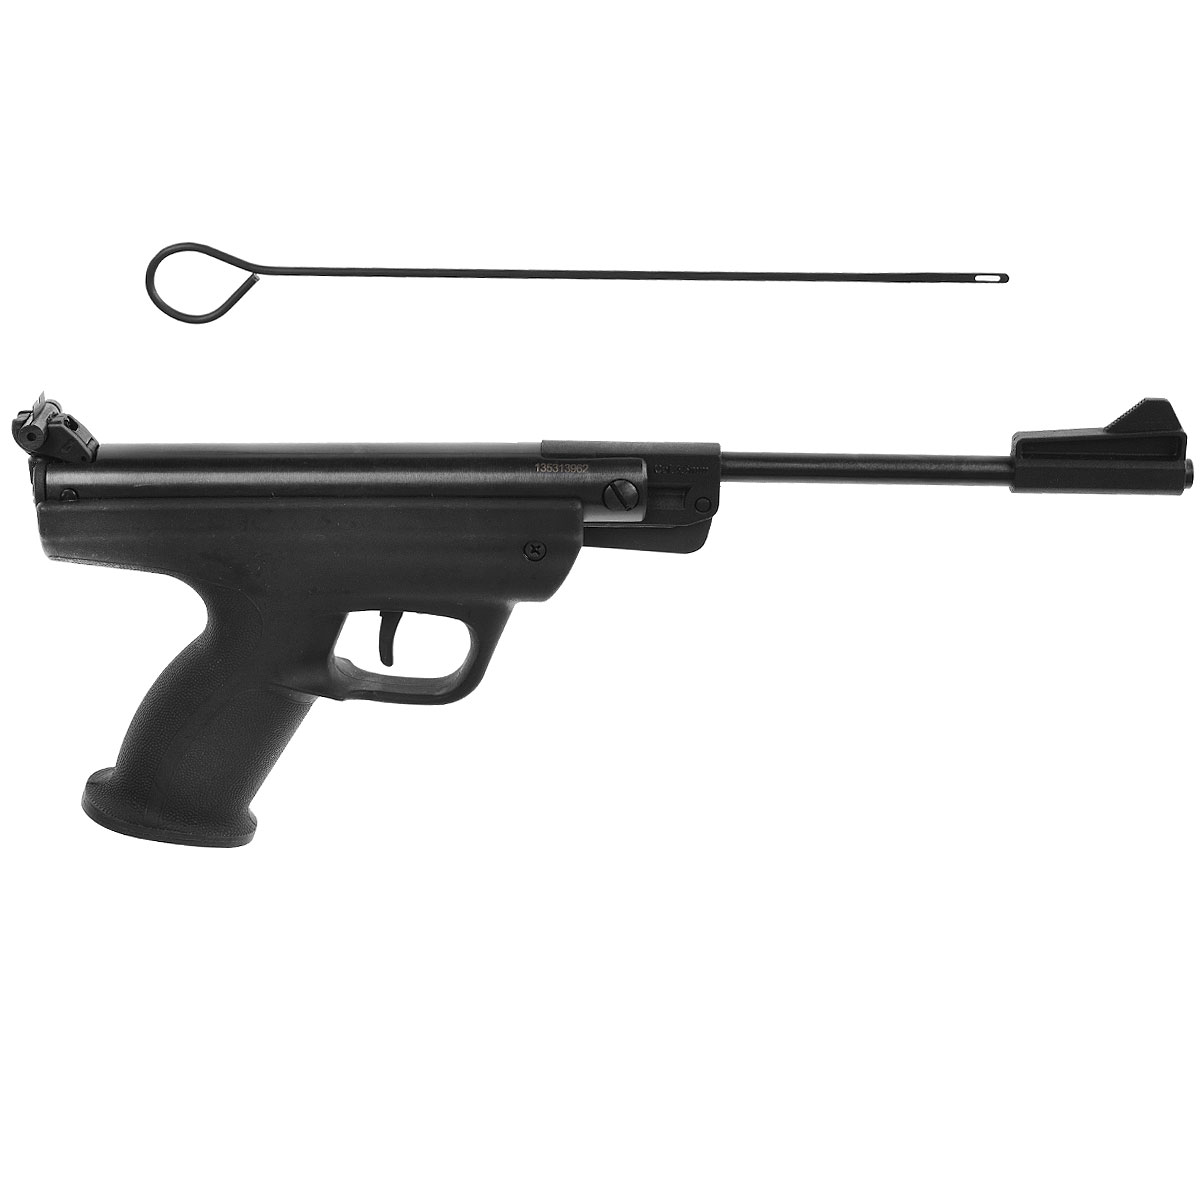 Байкал МР-53М пистолет пневматический, spring, 4,5 мм Байкал